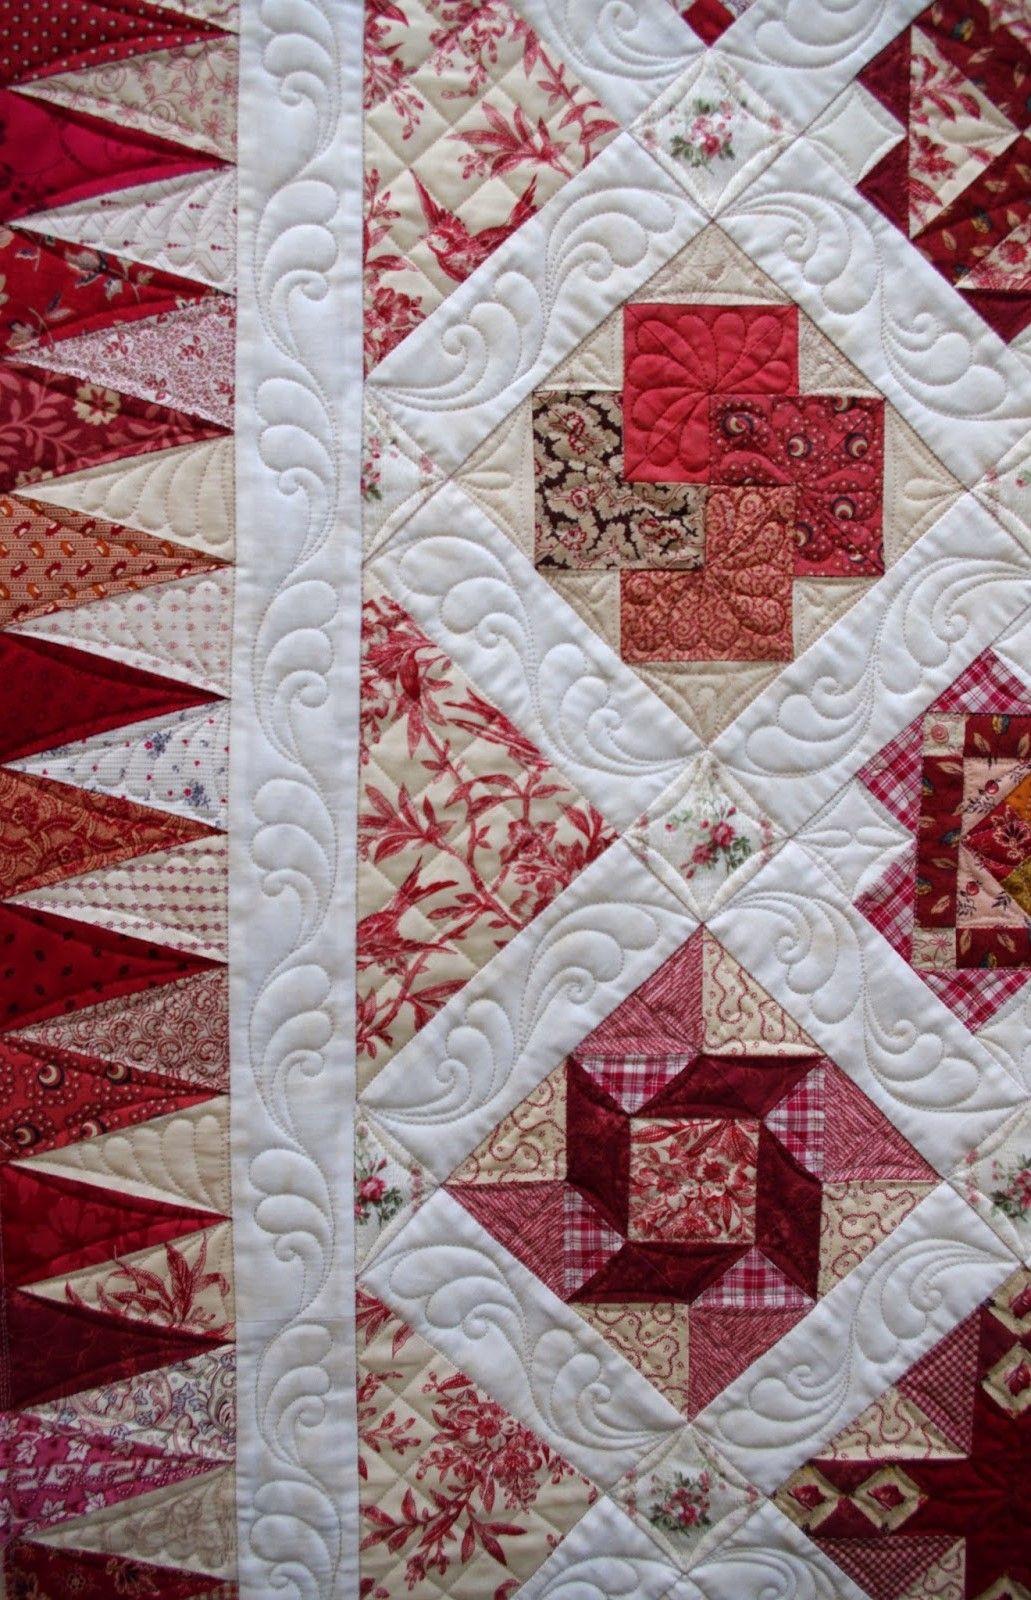 Border Quilting By Karen Terrens Zutphen Sampler Quilt By Jenny Machine Quilting Patterns Quilts Sampler Quilt